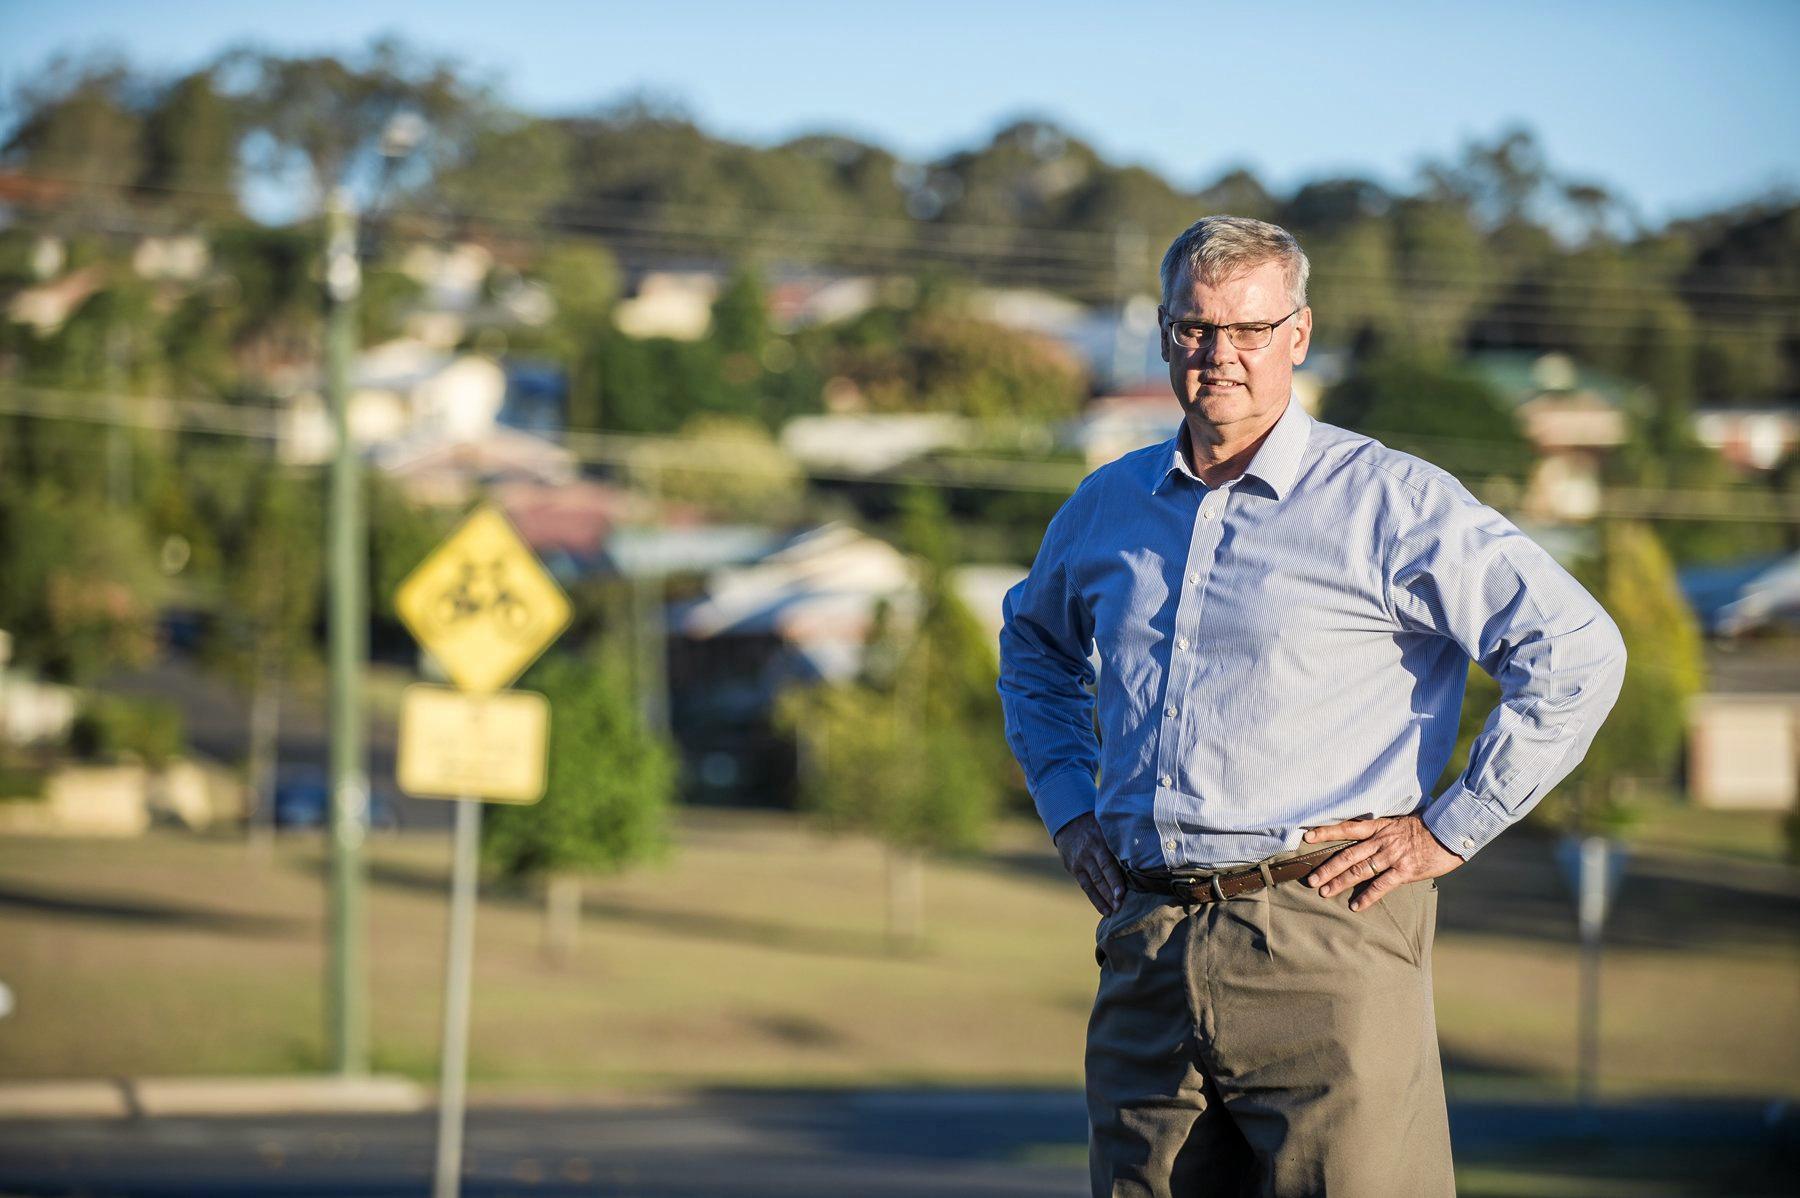 TOP HONOUR: University of Southern Queensland Professor Jim Cavaye won the International Community Development Society's Community Development Achievement Award.